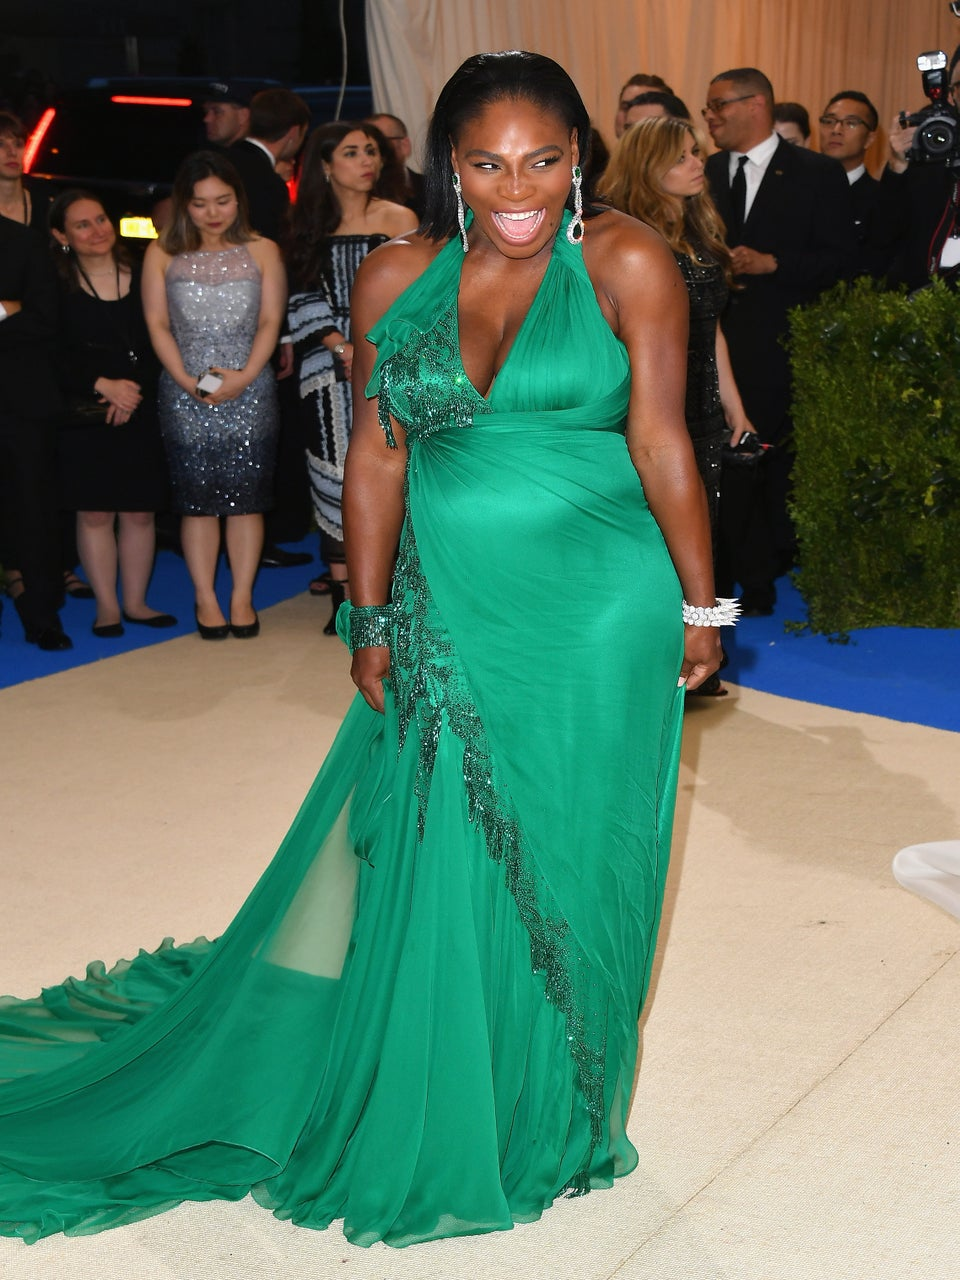 Pregnant Serena Williams Channels Her Inner Na'vi Warrior At Disney's Animal Kingdom